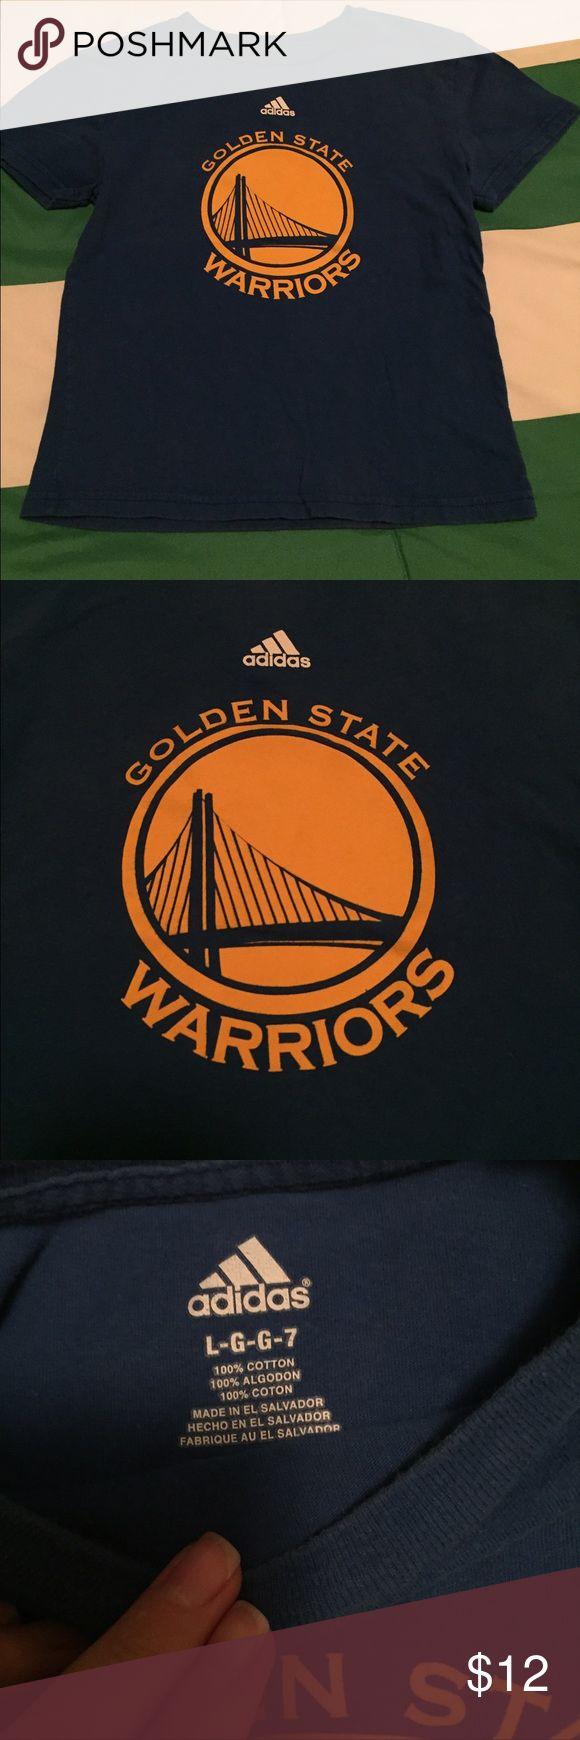 Boys 7 Golden State Warriors Adidas Boys size 7 tshirt. Golden state warriors. Adidas. Adidas Shirts & Tops Tees - Short Sleeve